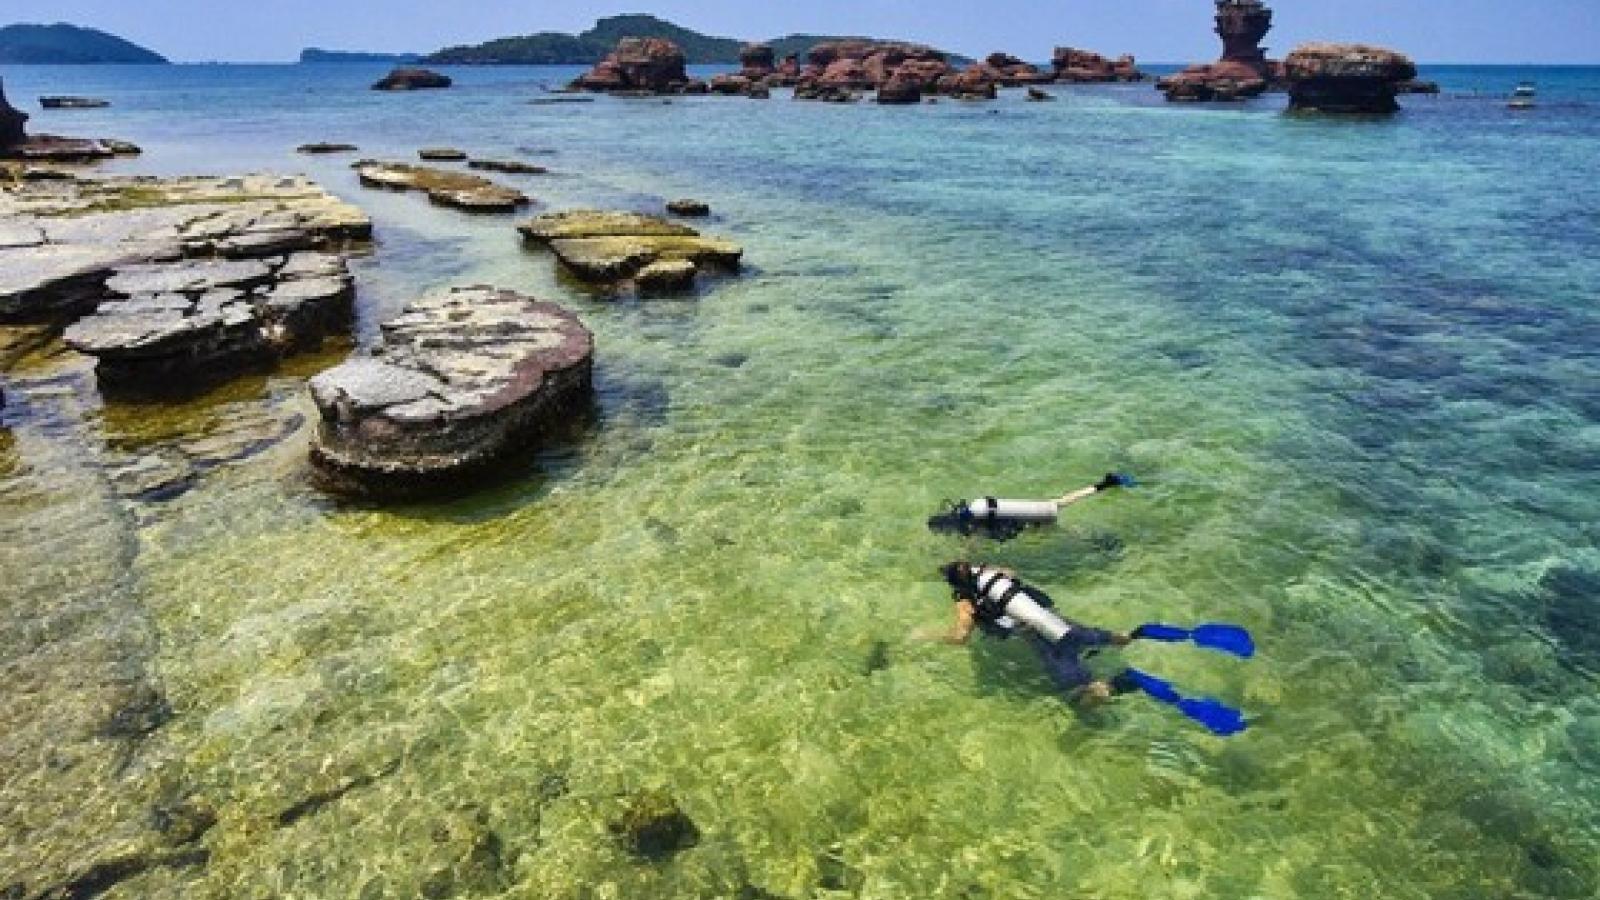 Hong Kong newspaper highlights tourism potential of Phu Quoc